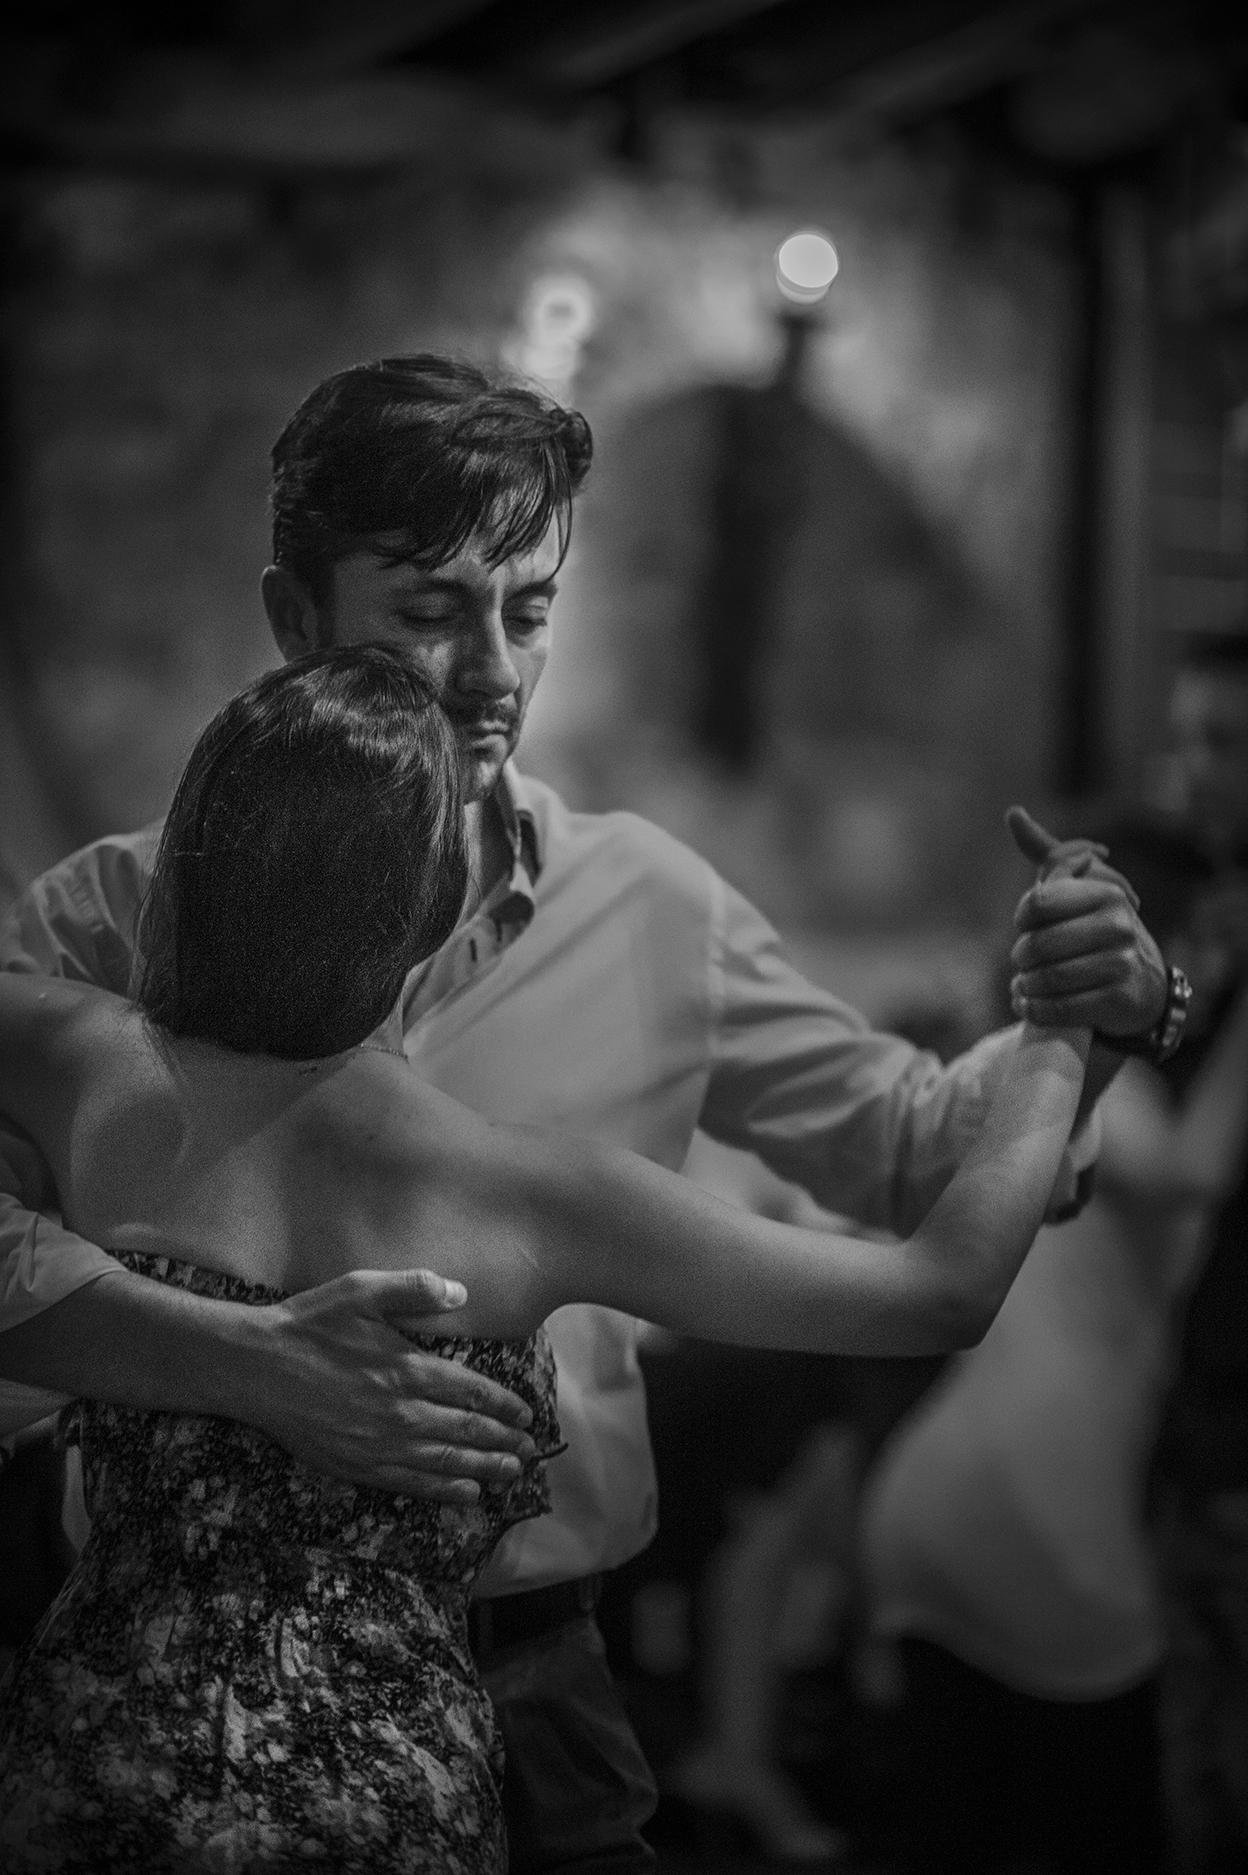 © Staffan Löwstedt Titel: Tango Plats/Datum: Aten 2014  Bildmått: 29,5x 43,4 cm (pappersstorlek 35x50 cm)  Teknik: Digital c-print Träram med passepartout  42x52 cm  Upplaga: 10 Signerad: Ja  Pris: SEK 3900